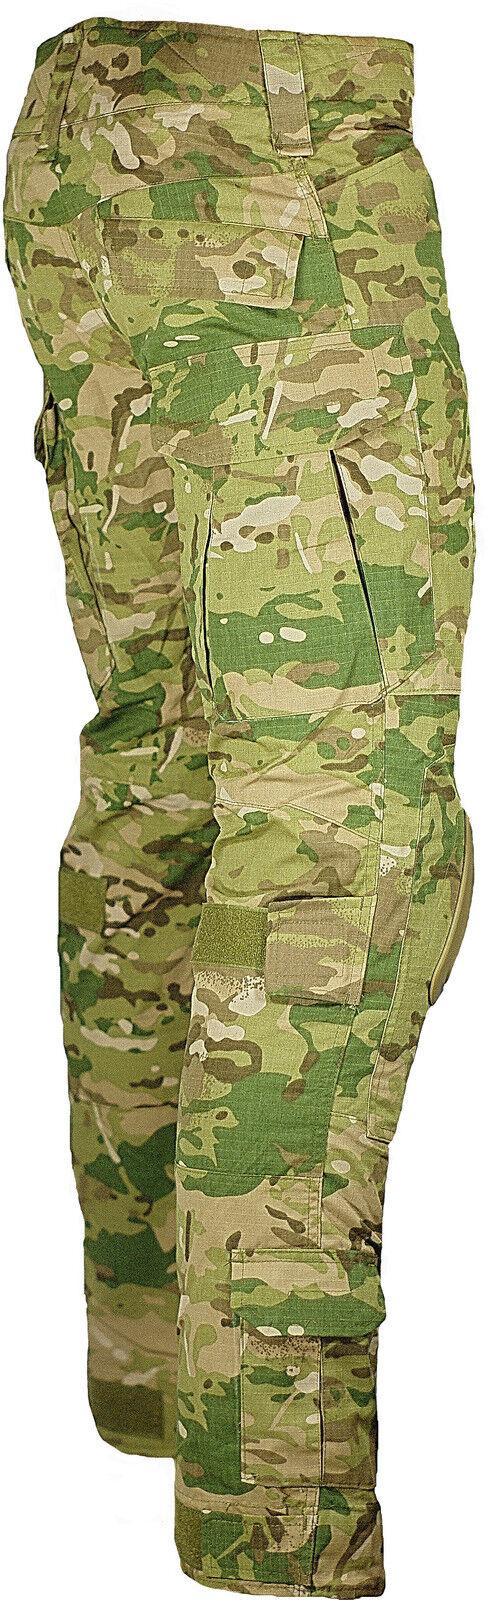 XS S XL M L XL S NATO ARMY WAIST MULTICAM MTP TROUSERS PANTS AIRSOFT KNEE PADS f003b5